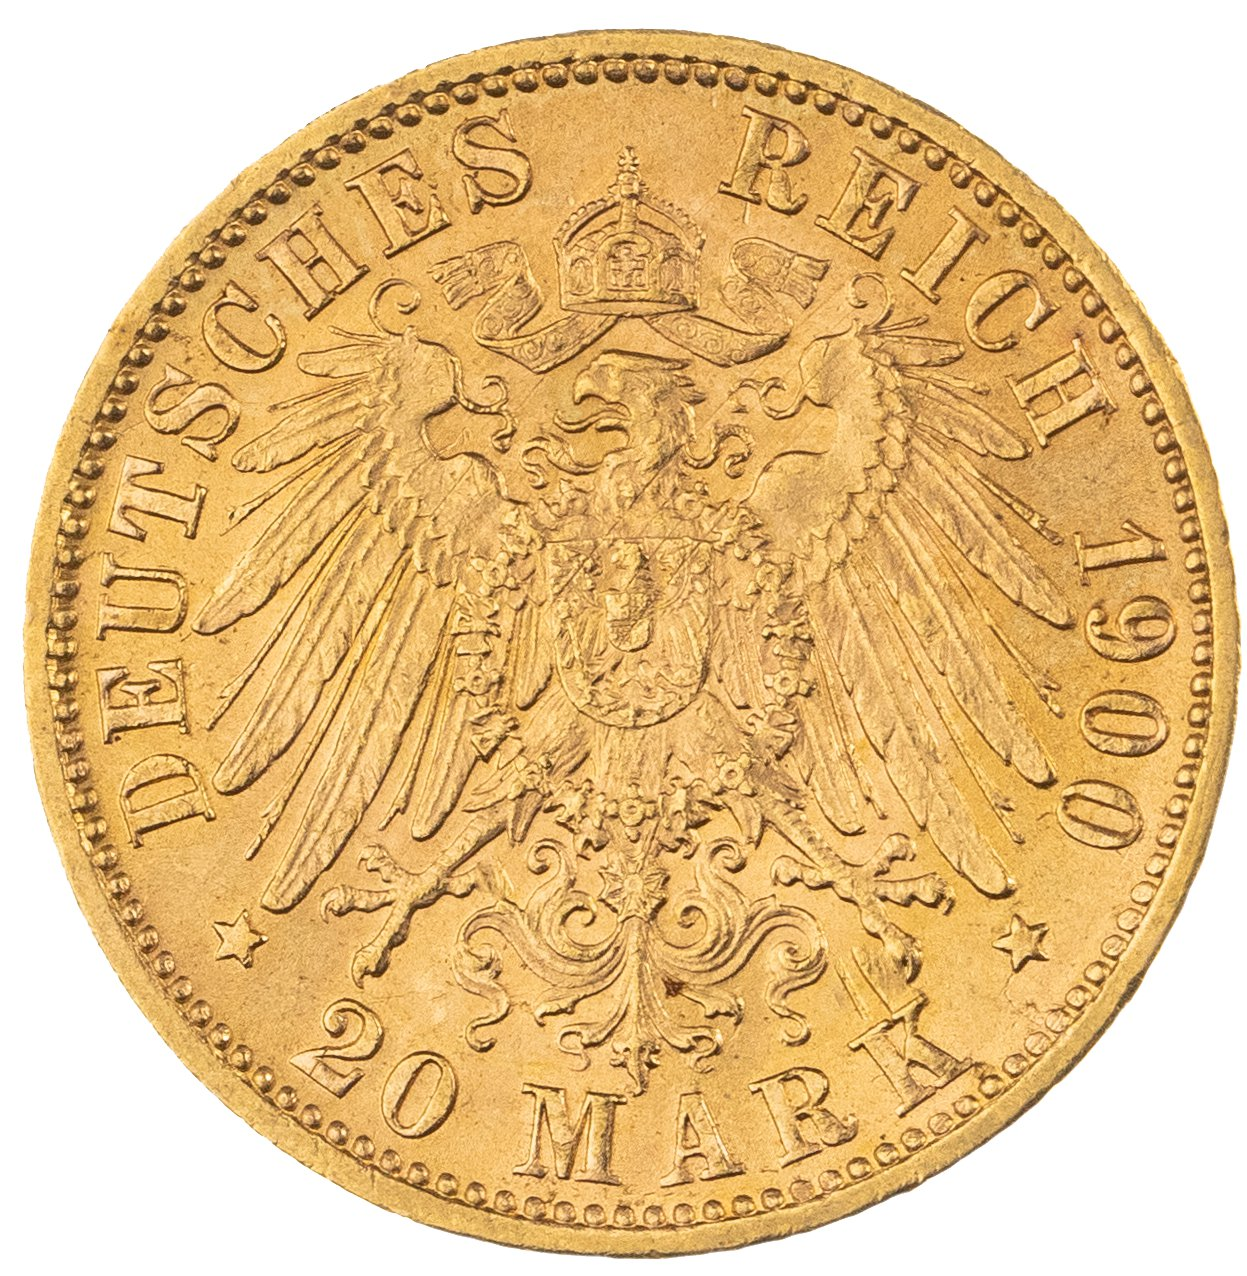 Lot 21 - Main catalogue münzen -  Sellschopp Auktionen GmbH Auction #1